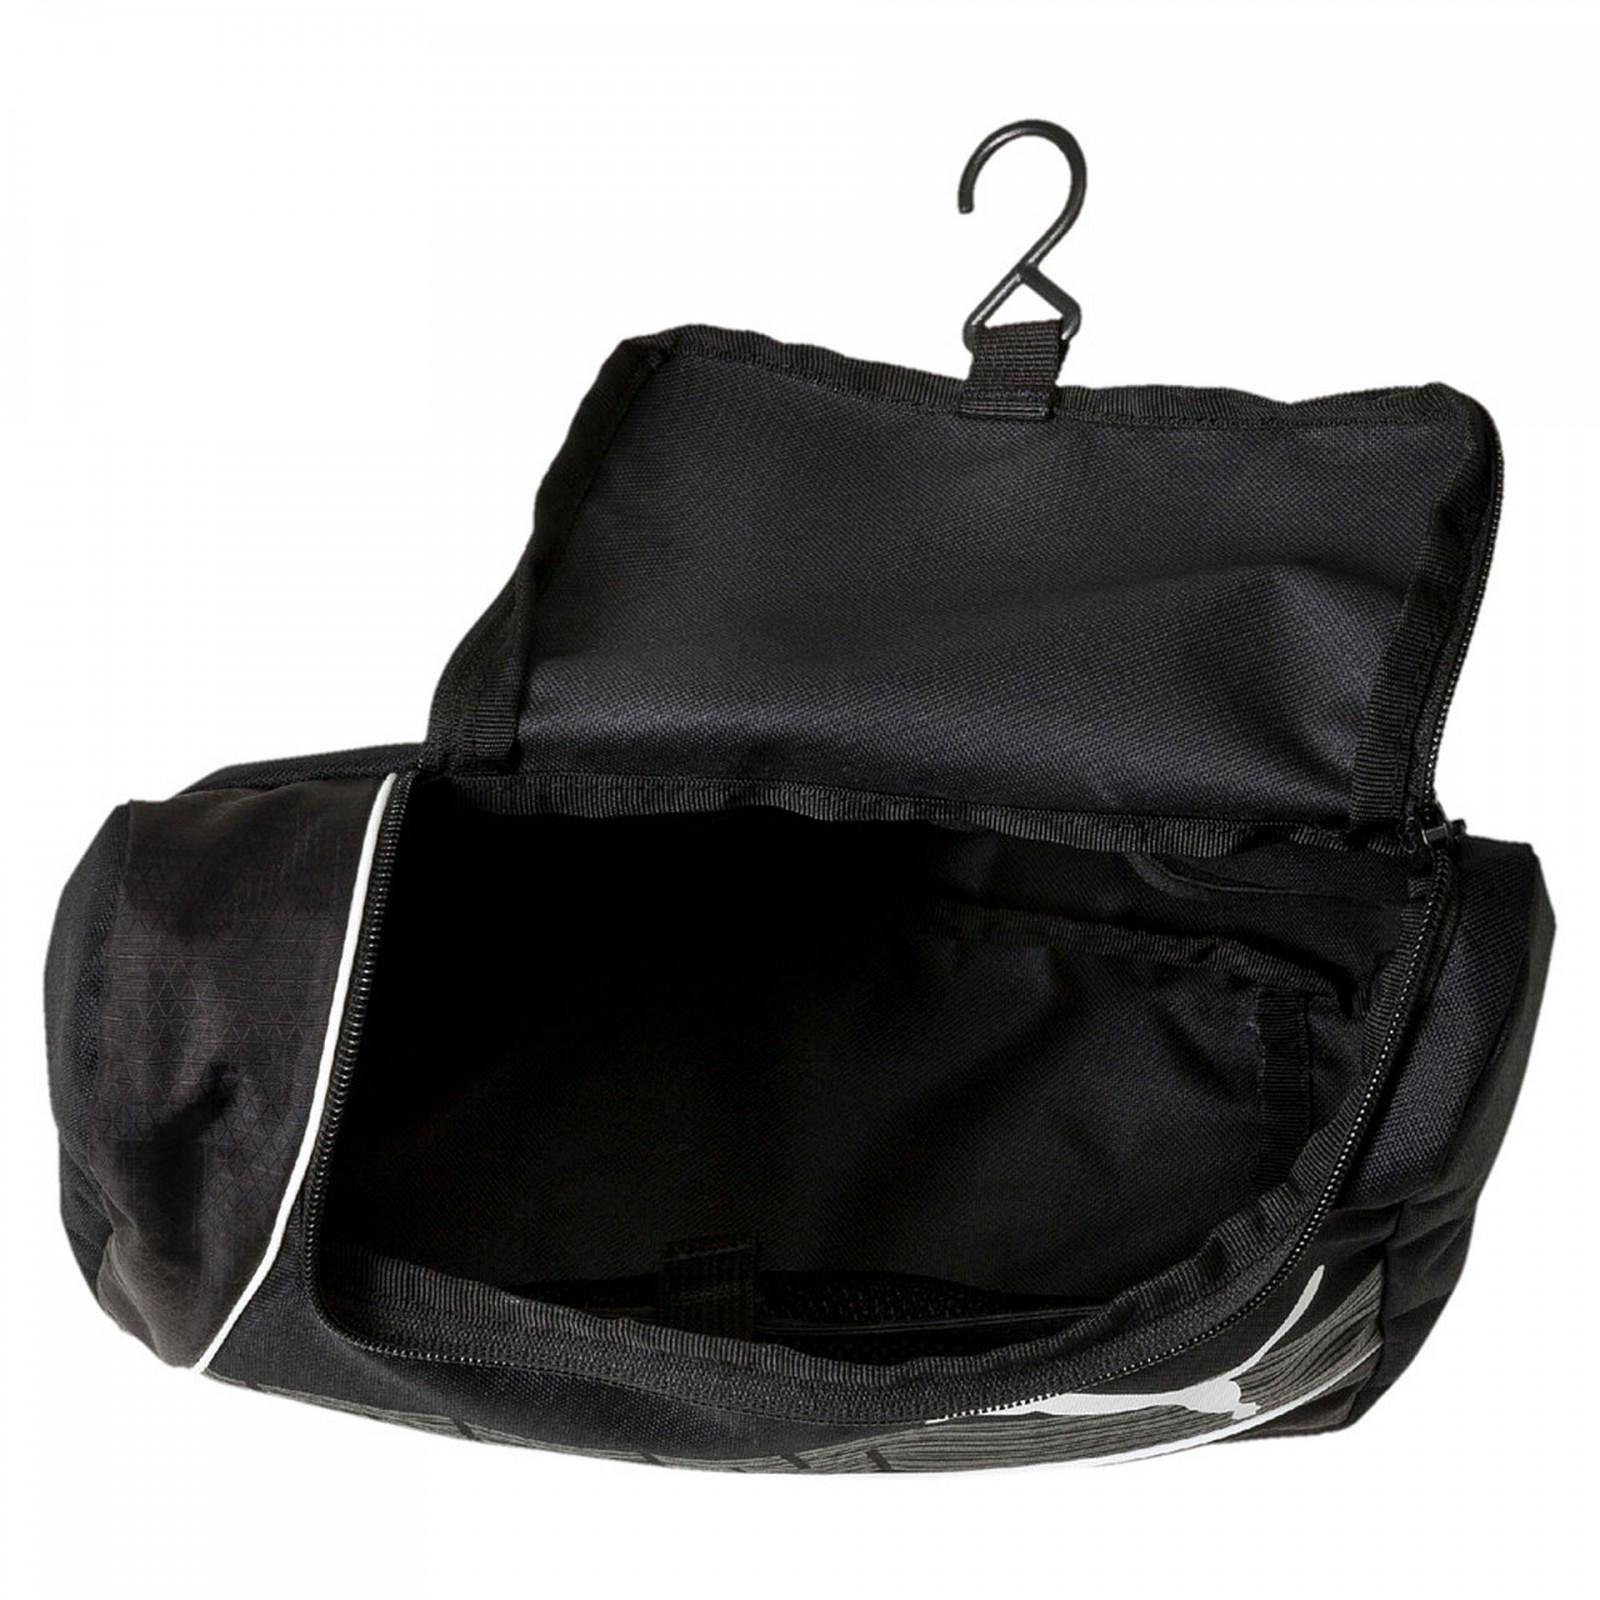 puma evopower bag